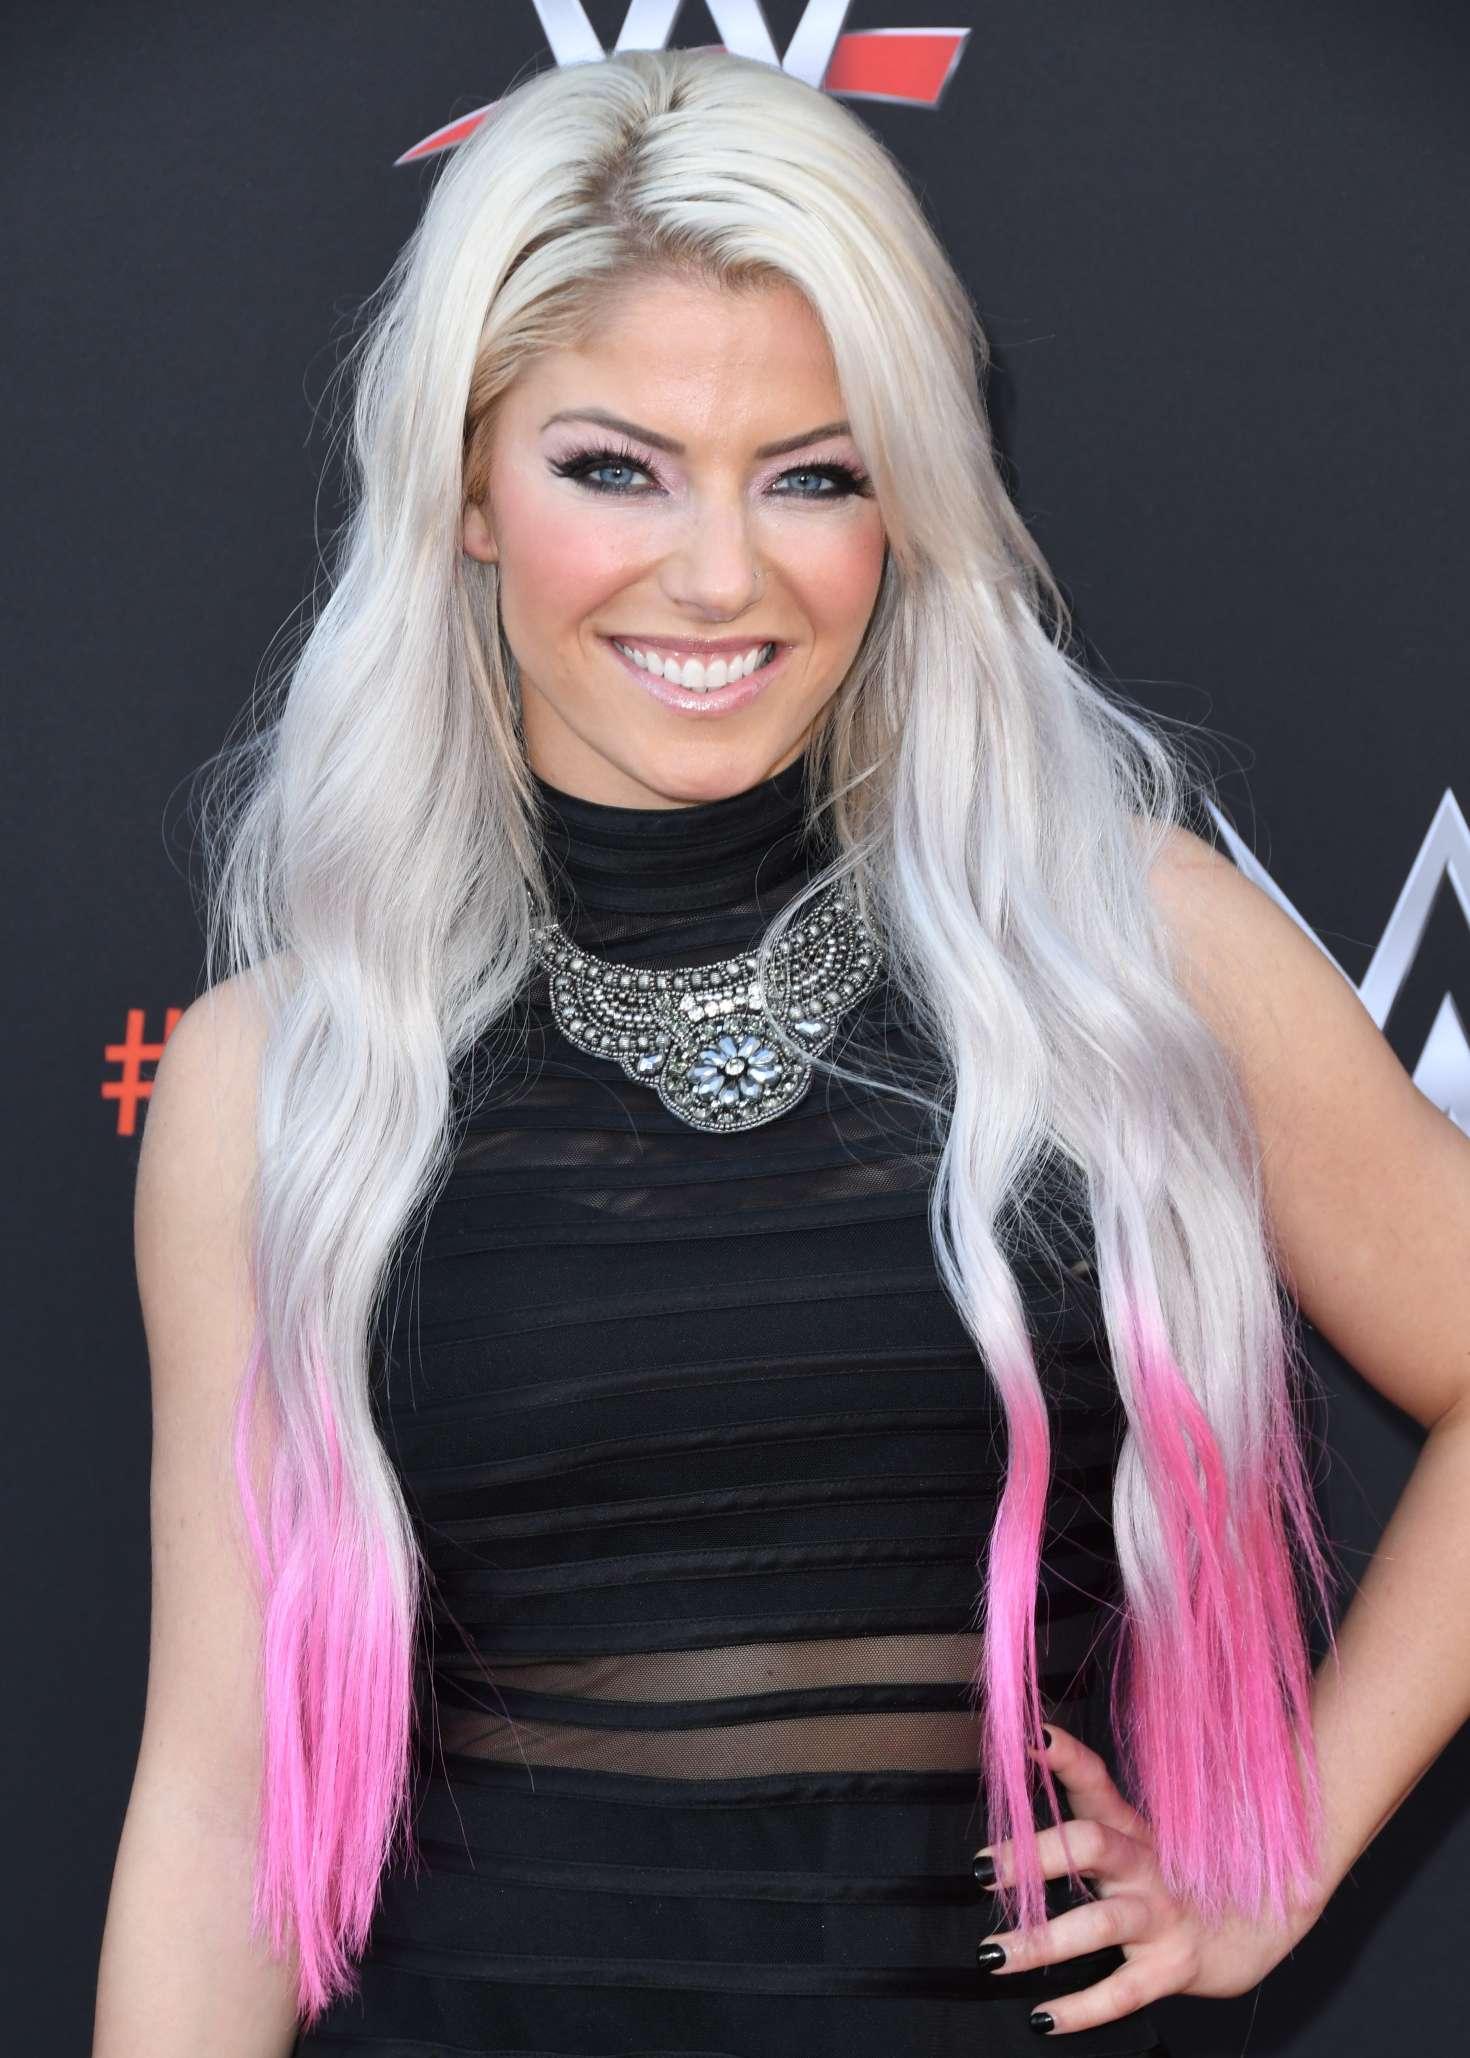 Alexa Bliss 2018 : Alexa Bliss: WWE FYC Event -04